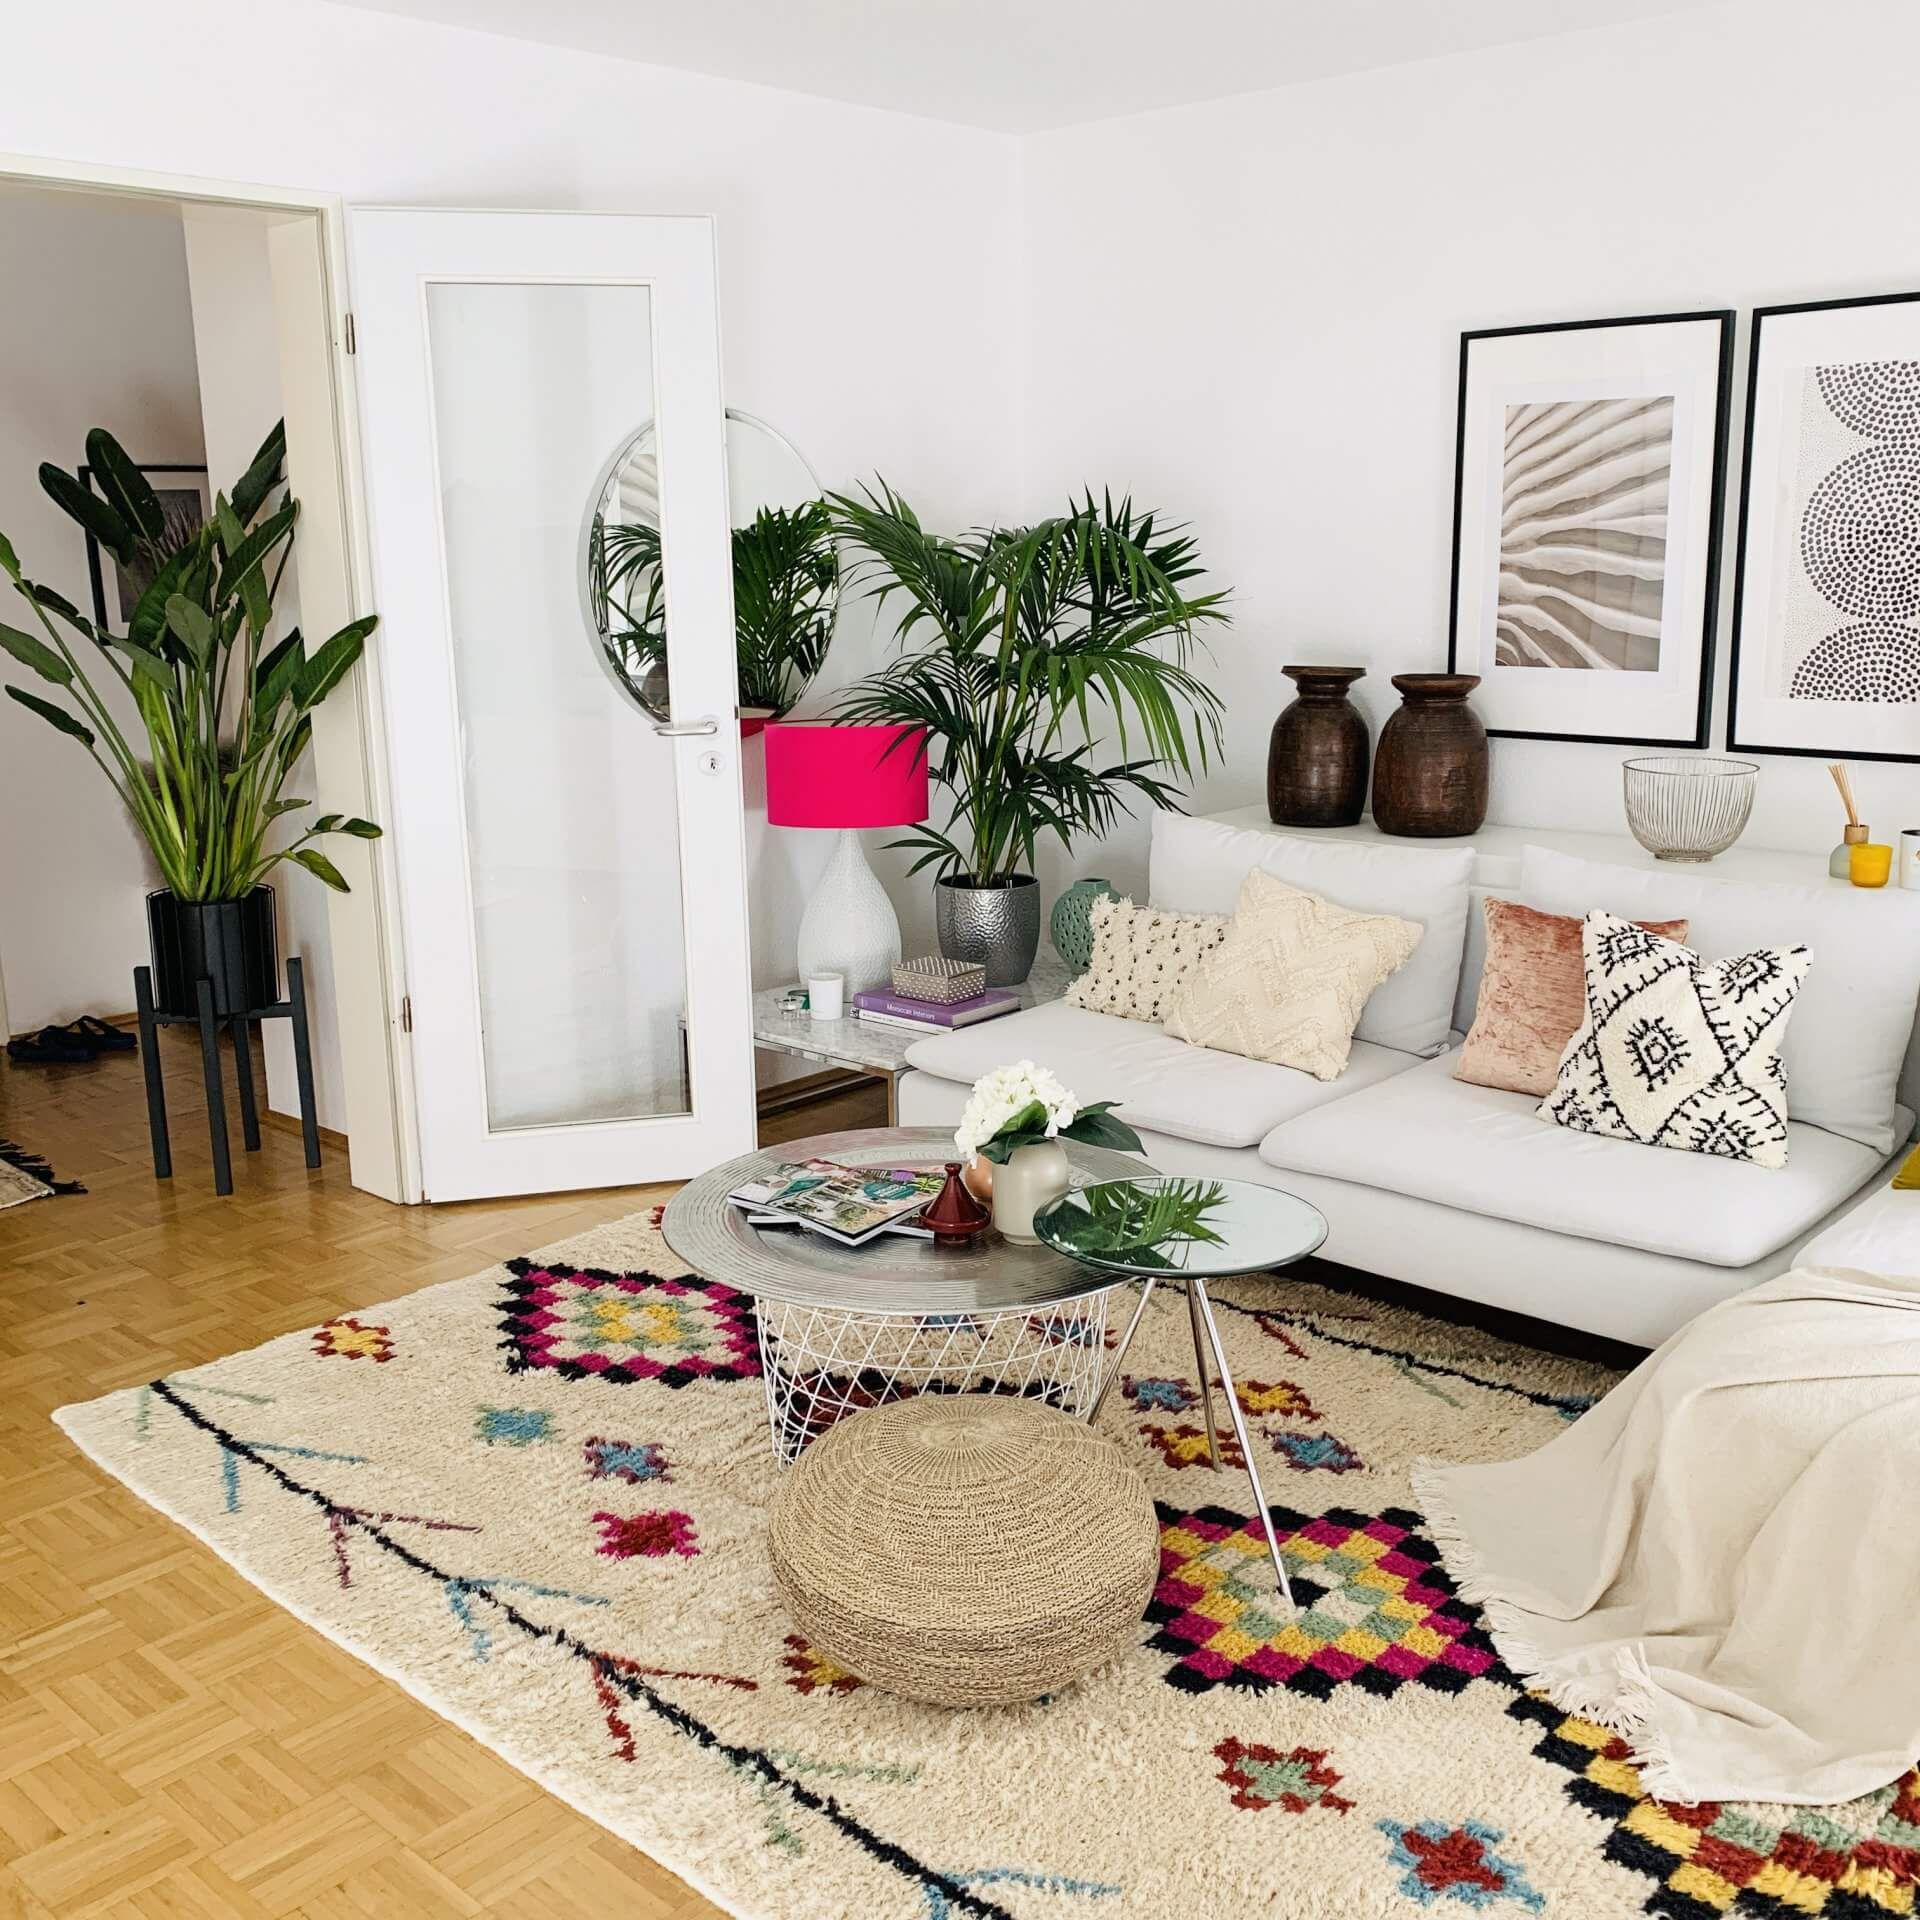 safa living interior